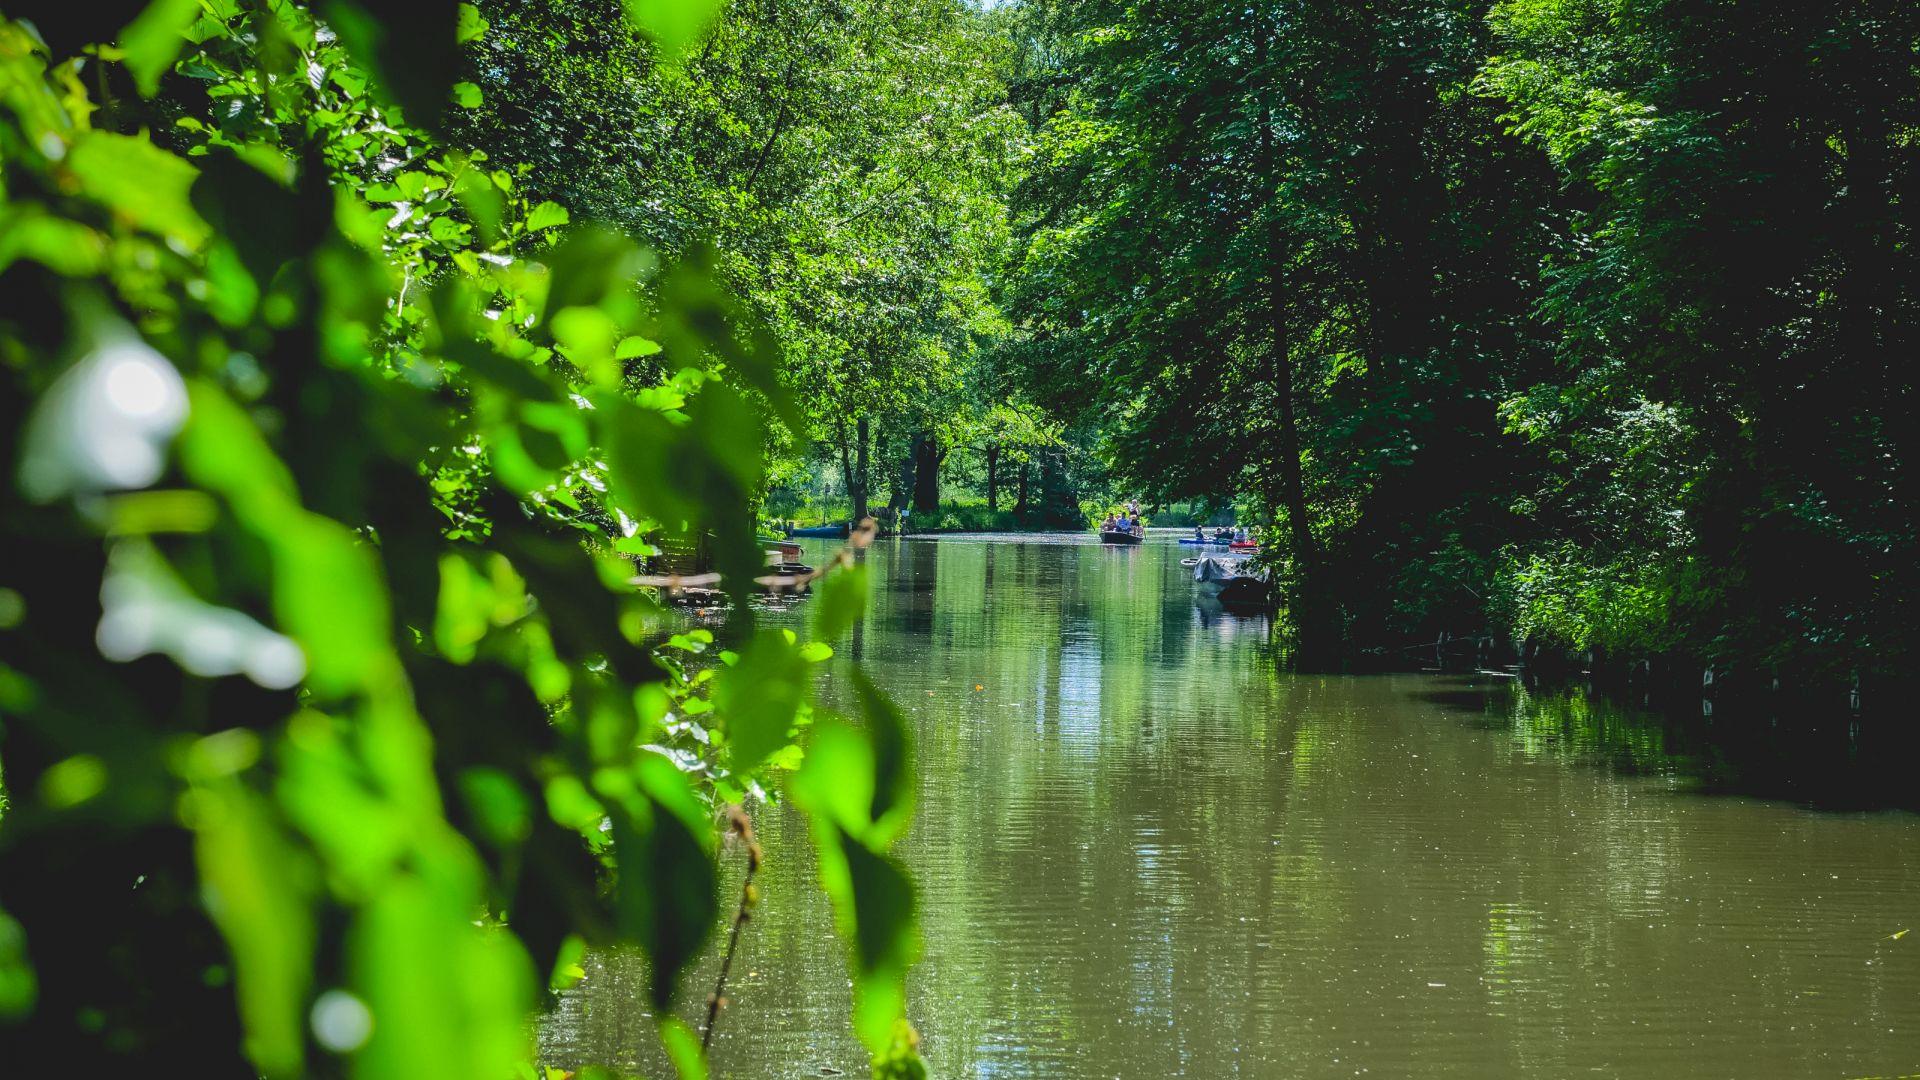 Lübbenau: View of a busy canal